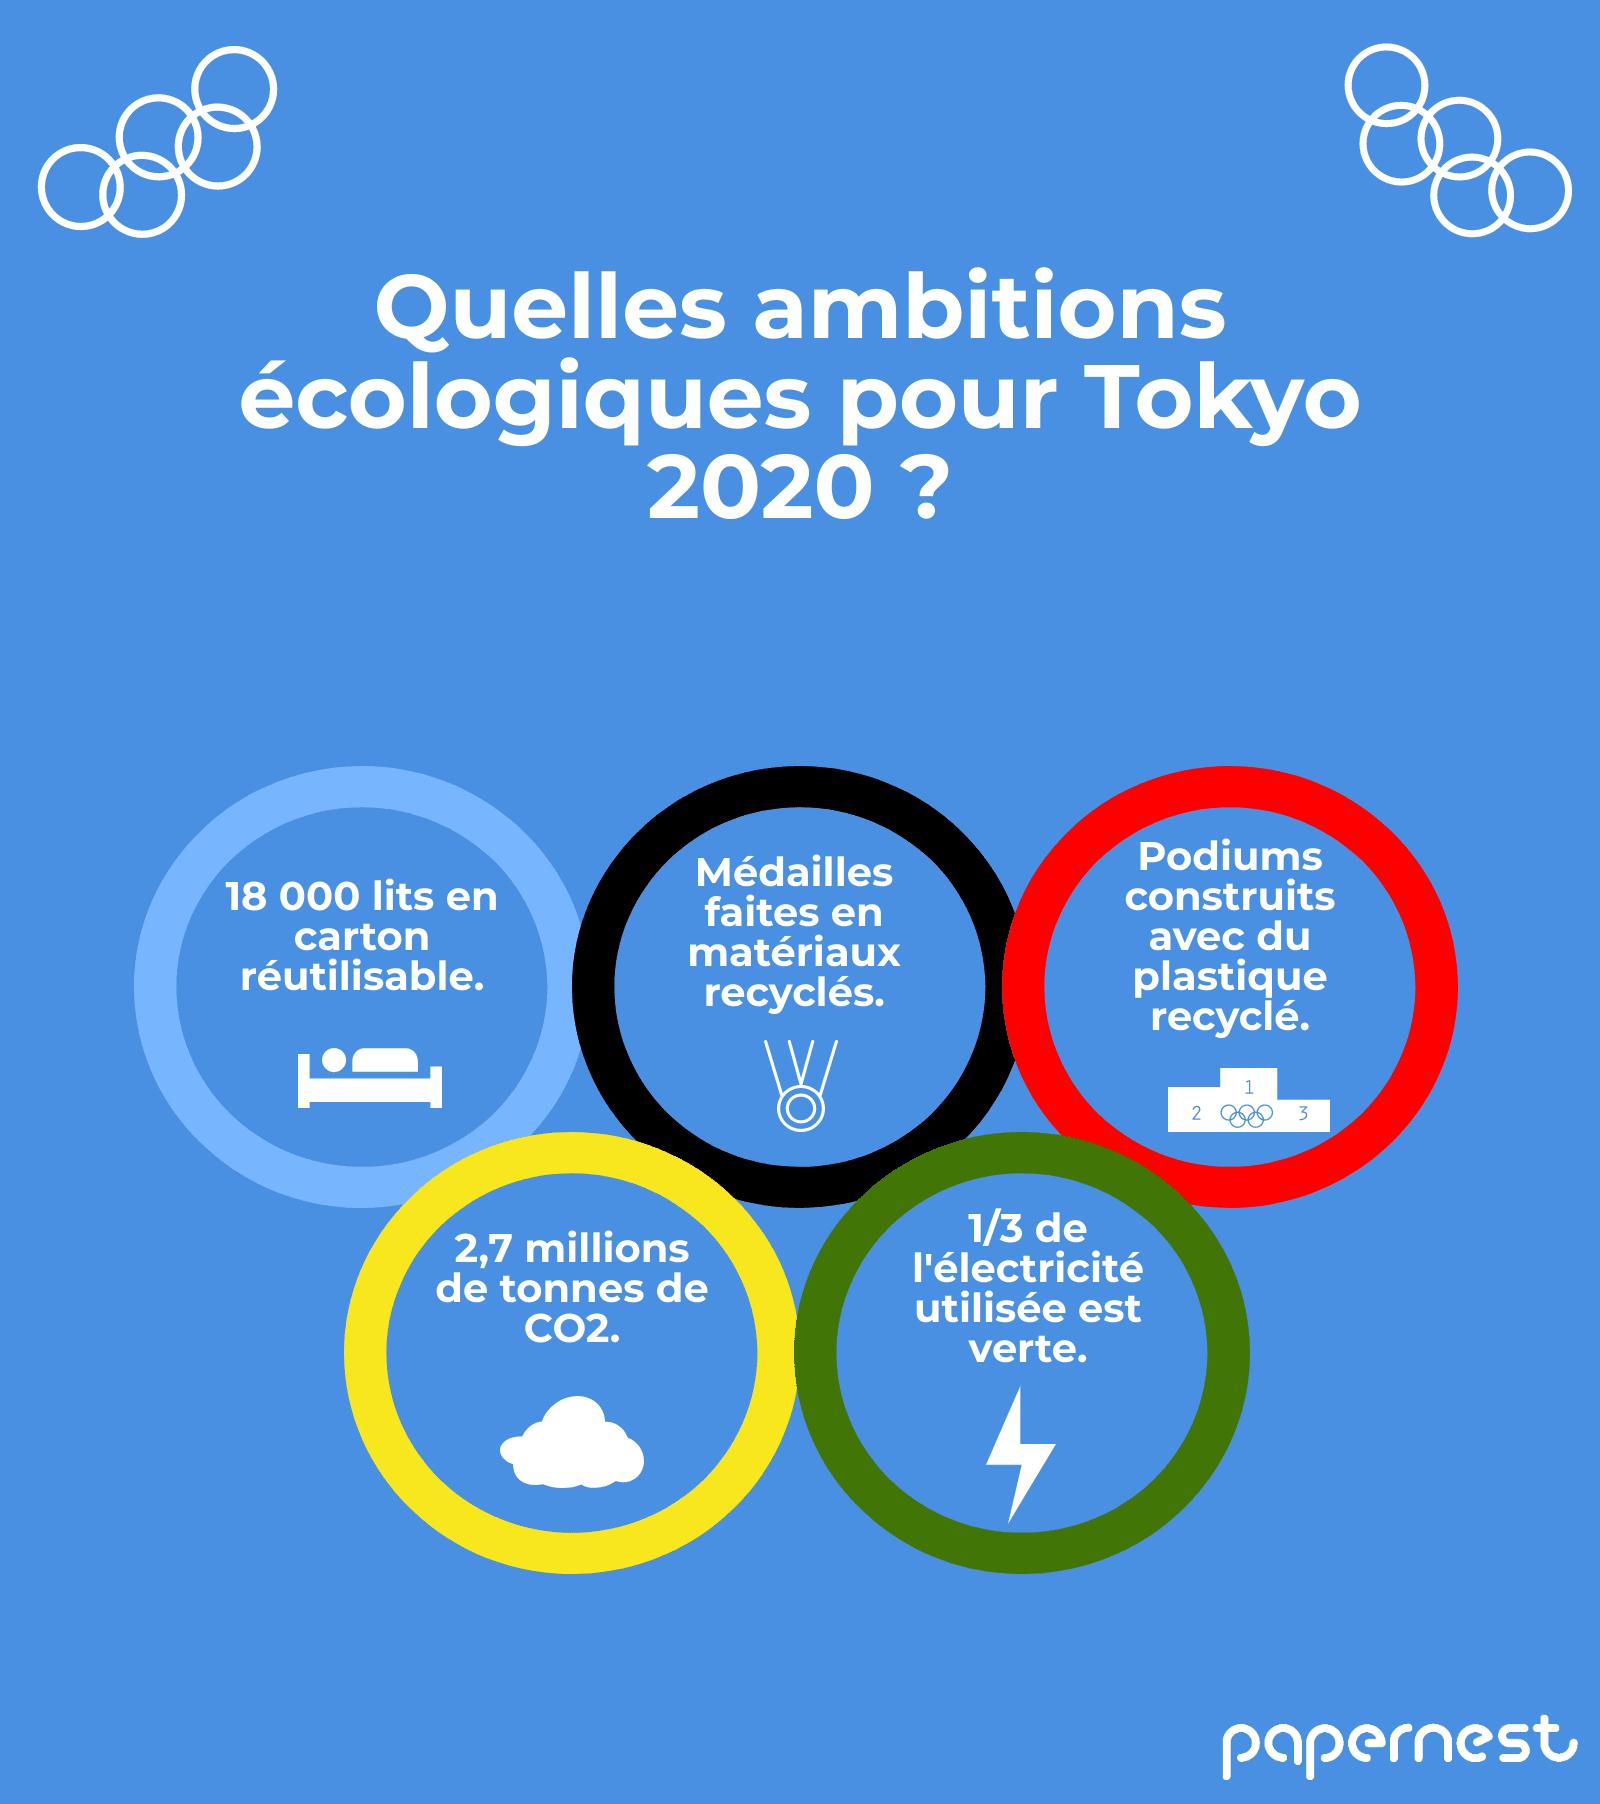 engagements environnementaux jo tokyo 2020